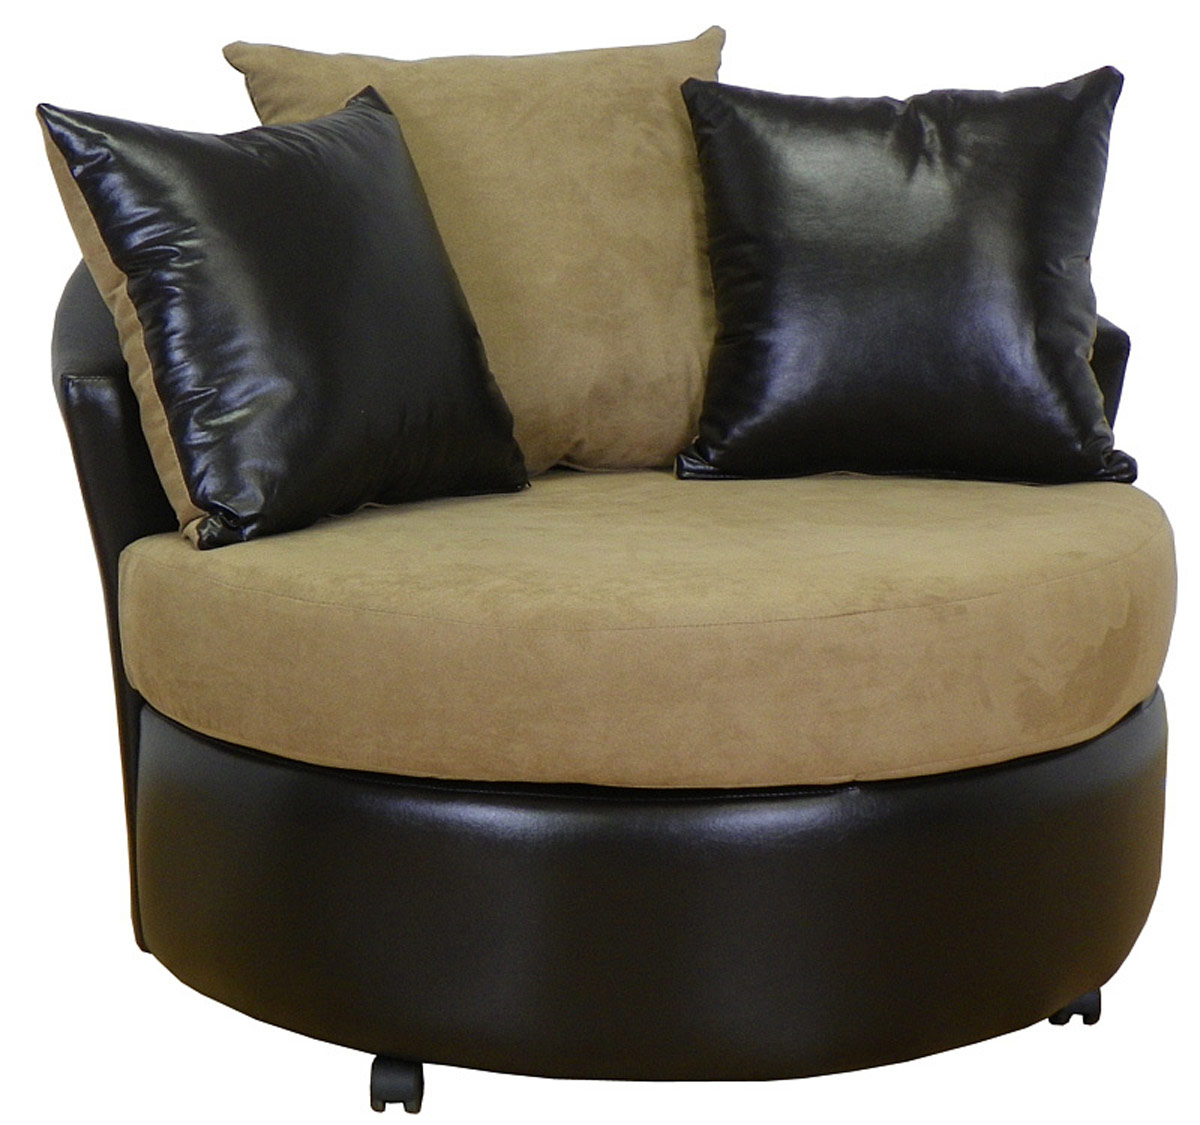 Chelsea Home Furniture Alexa Swivel Chair - Bulldozer Mocha/Bicast Chocolate 675-BM